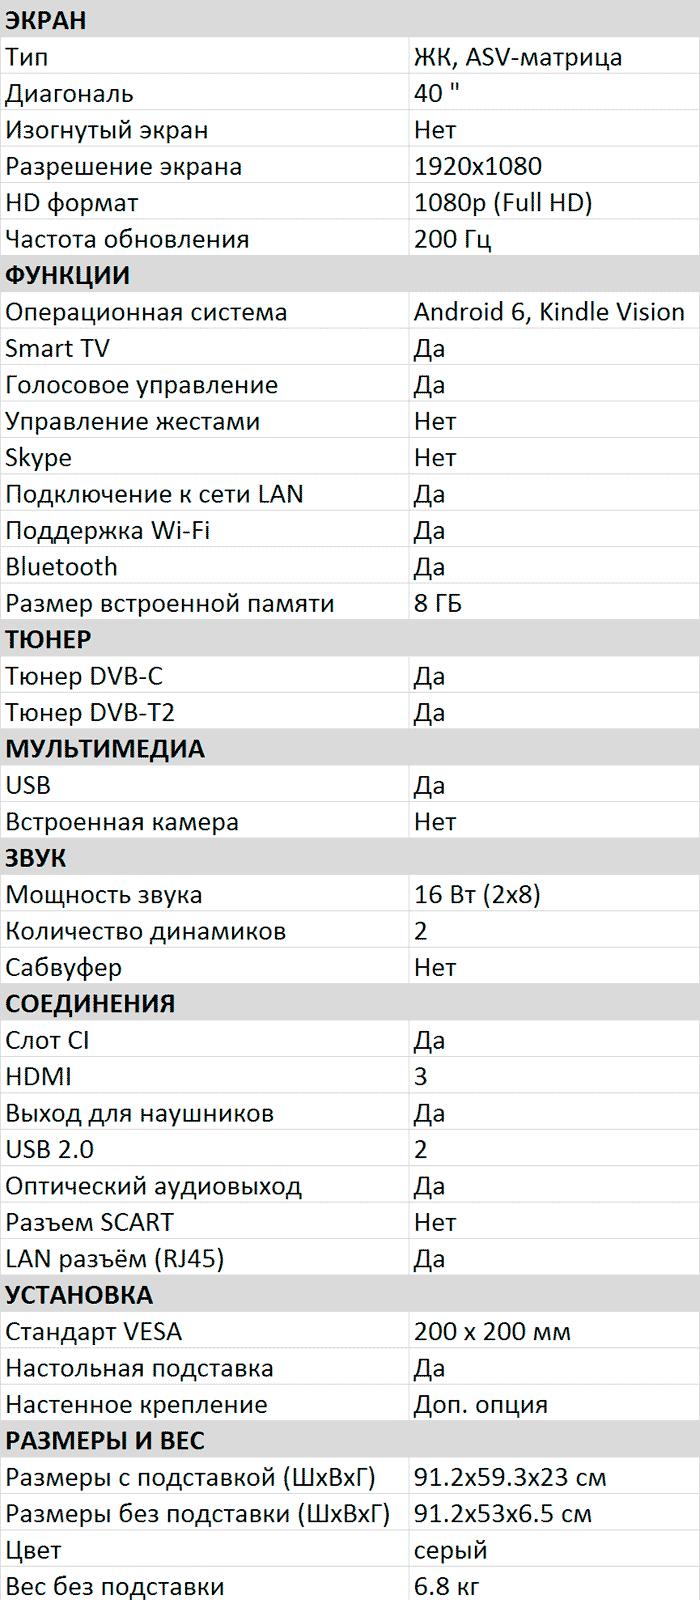 Характеристики FR50BR